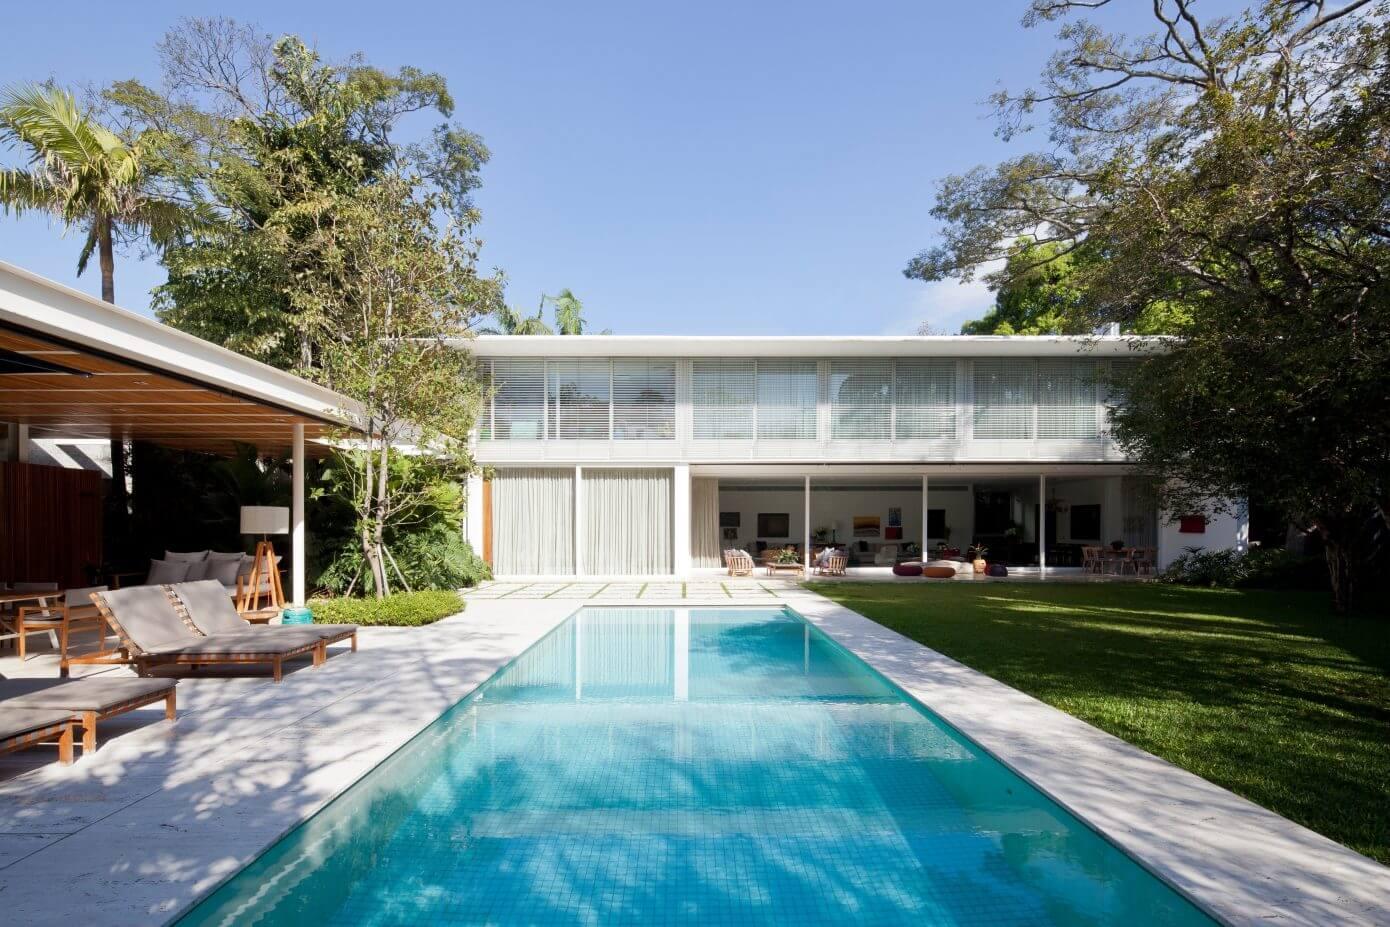 JKO House by Jacobsen Arquitetura